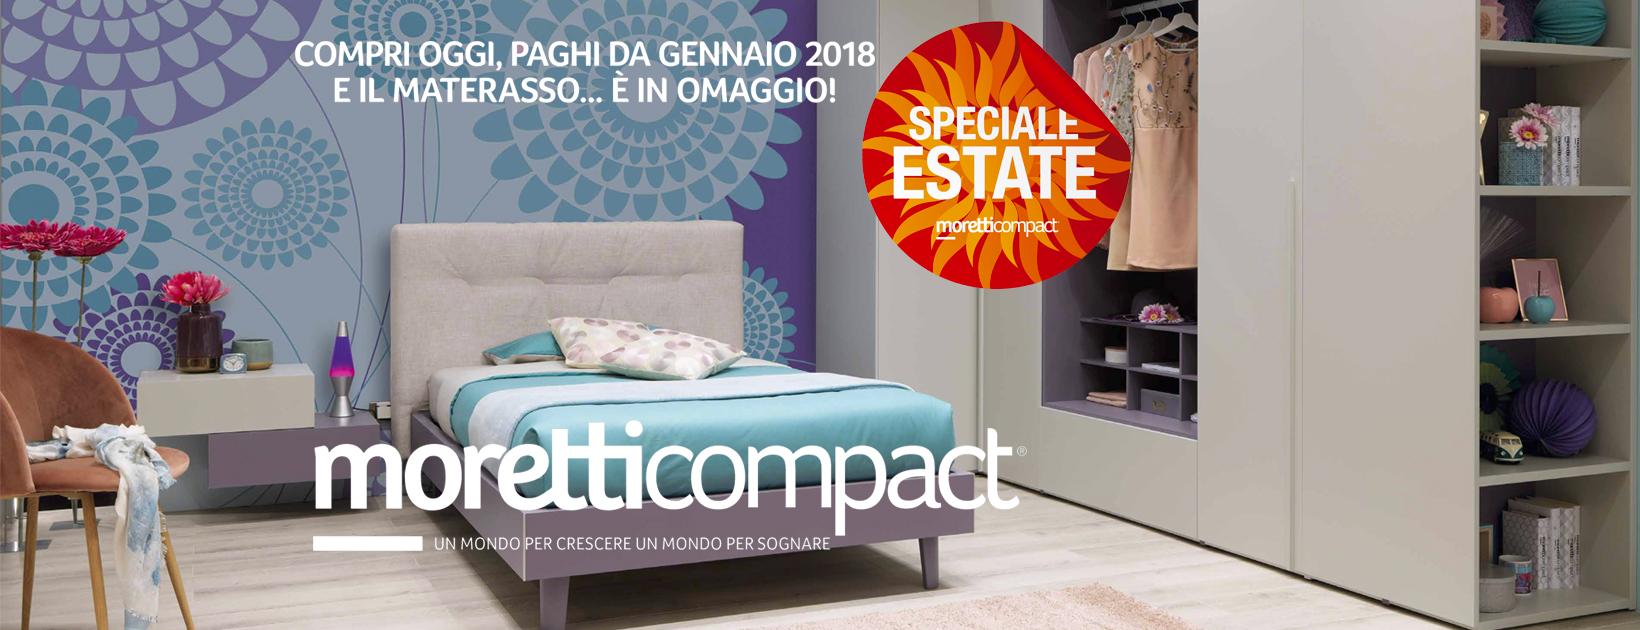 Speciale Estate\